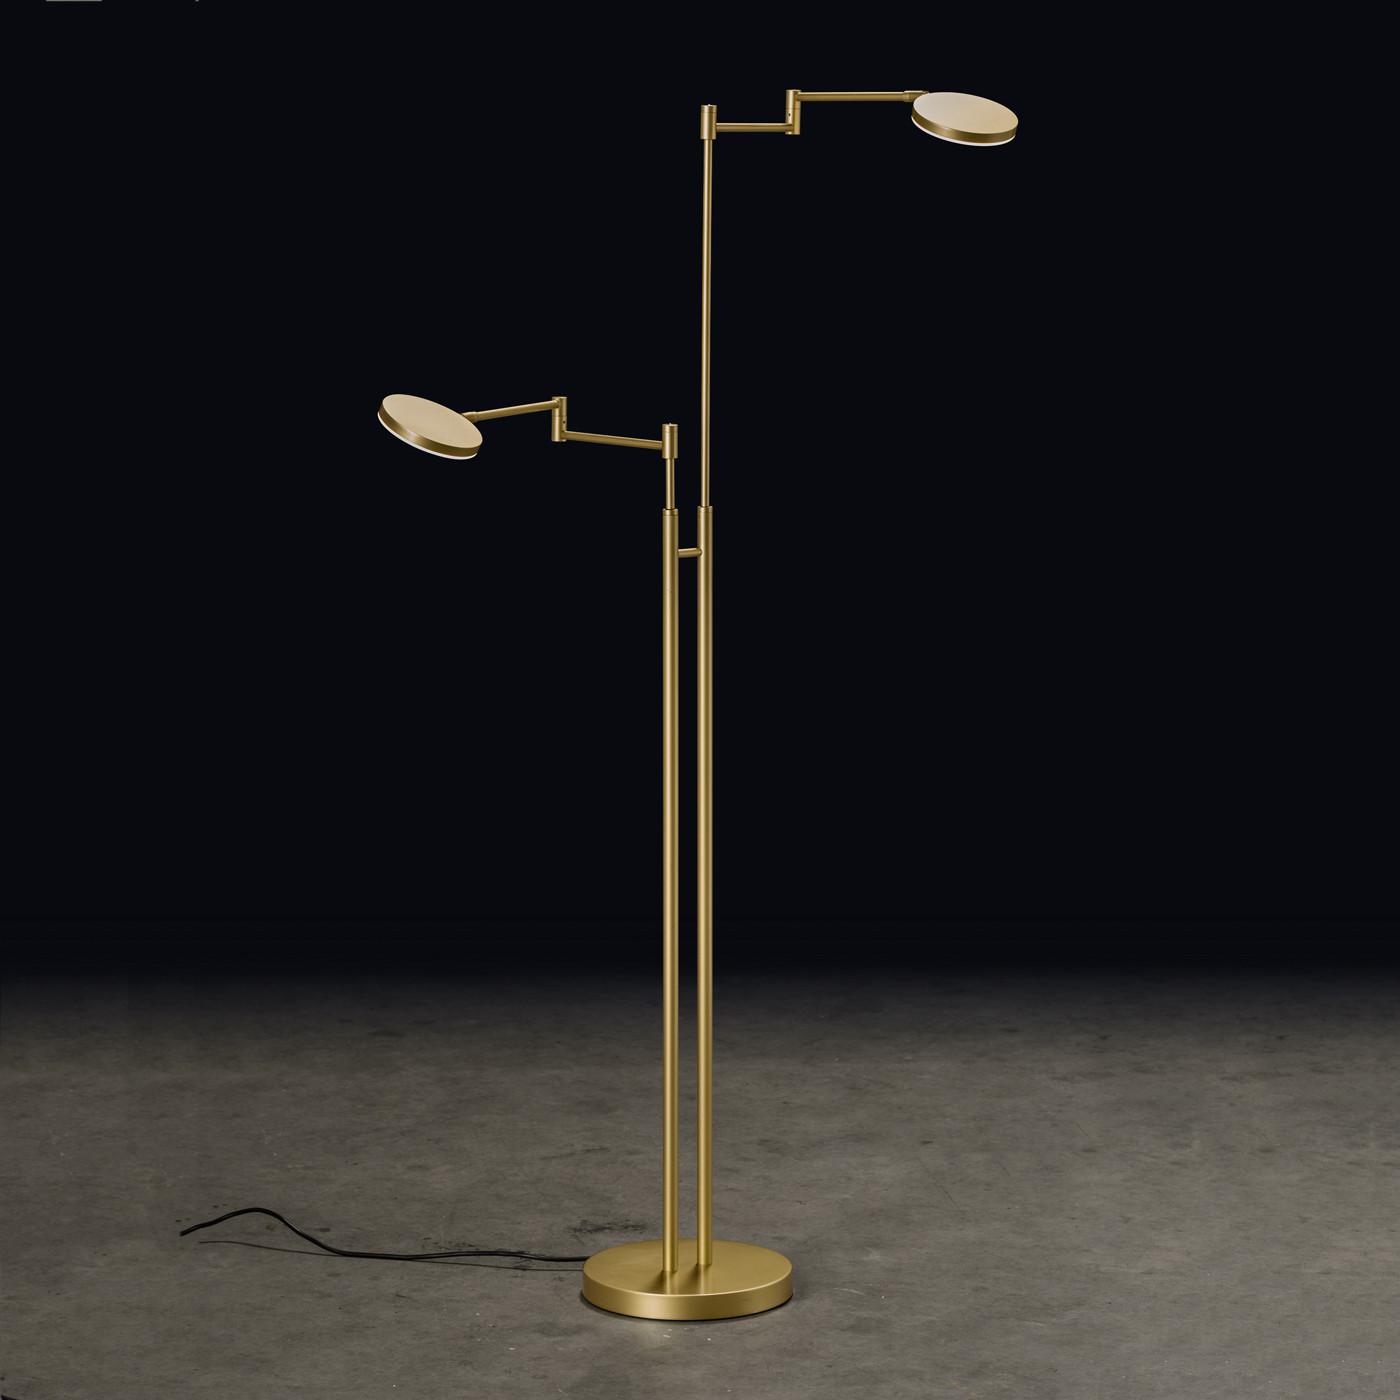 Holtkötter Plano 9652 Floor Lamp At